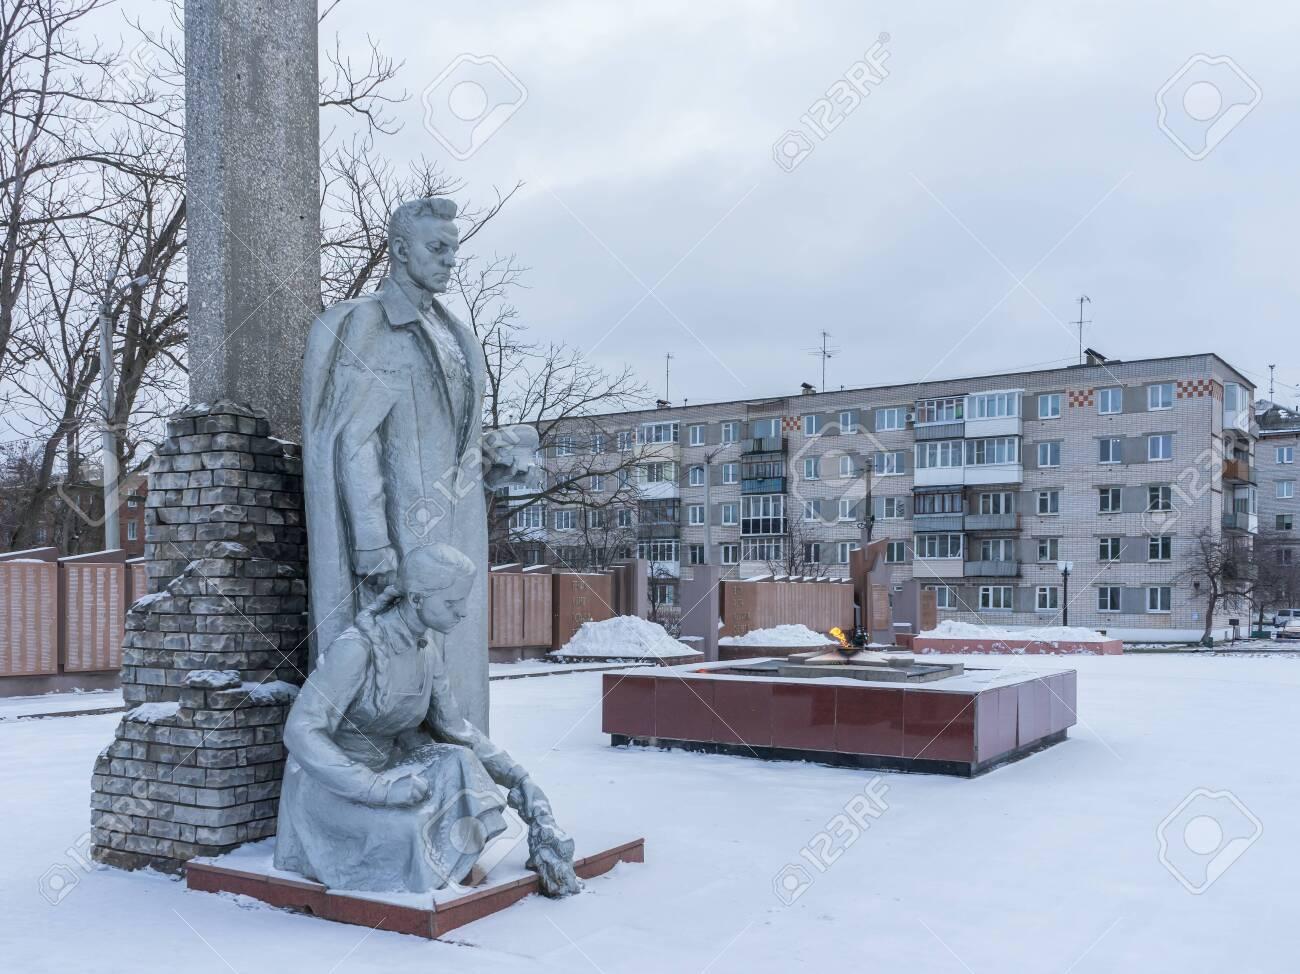 Balahna city, Nizhny Novgorod region/Russia - january 05 2020: Military monument and eternal flame - 142402970